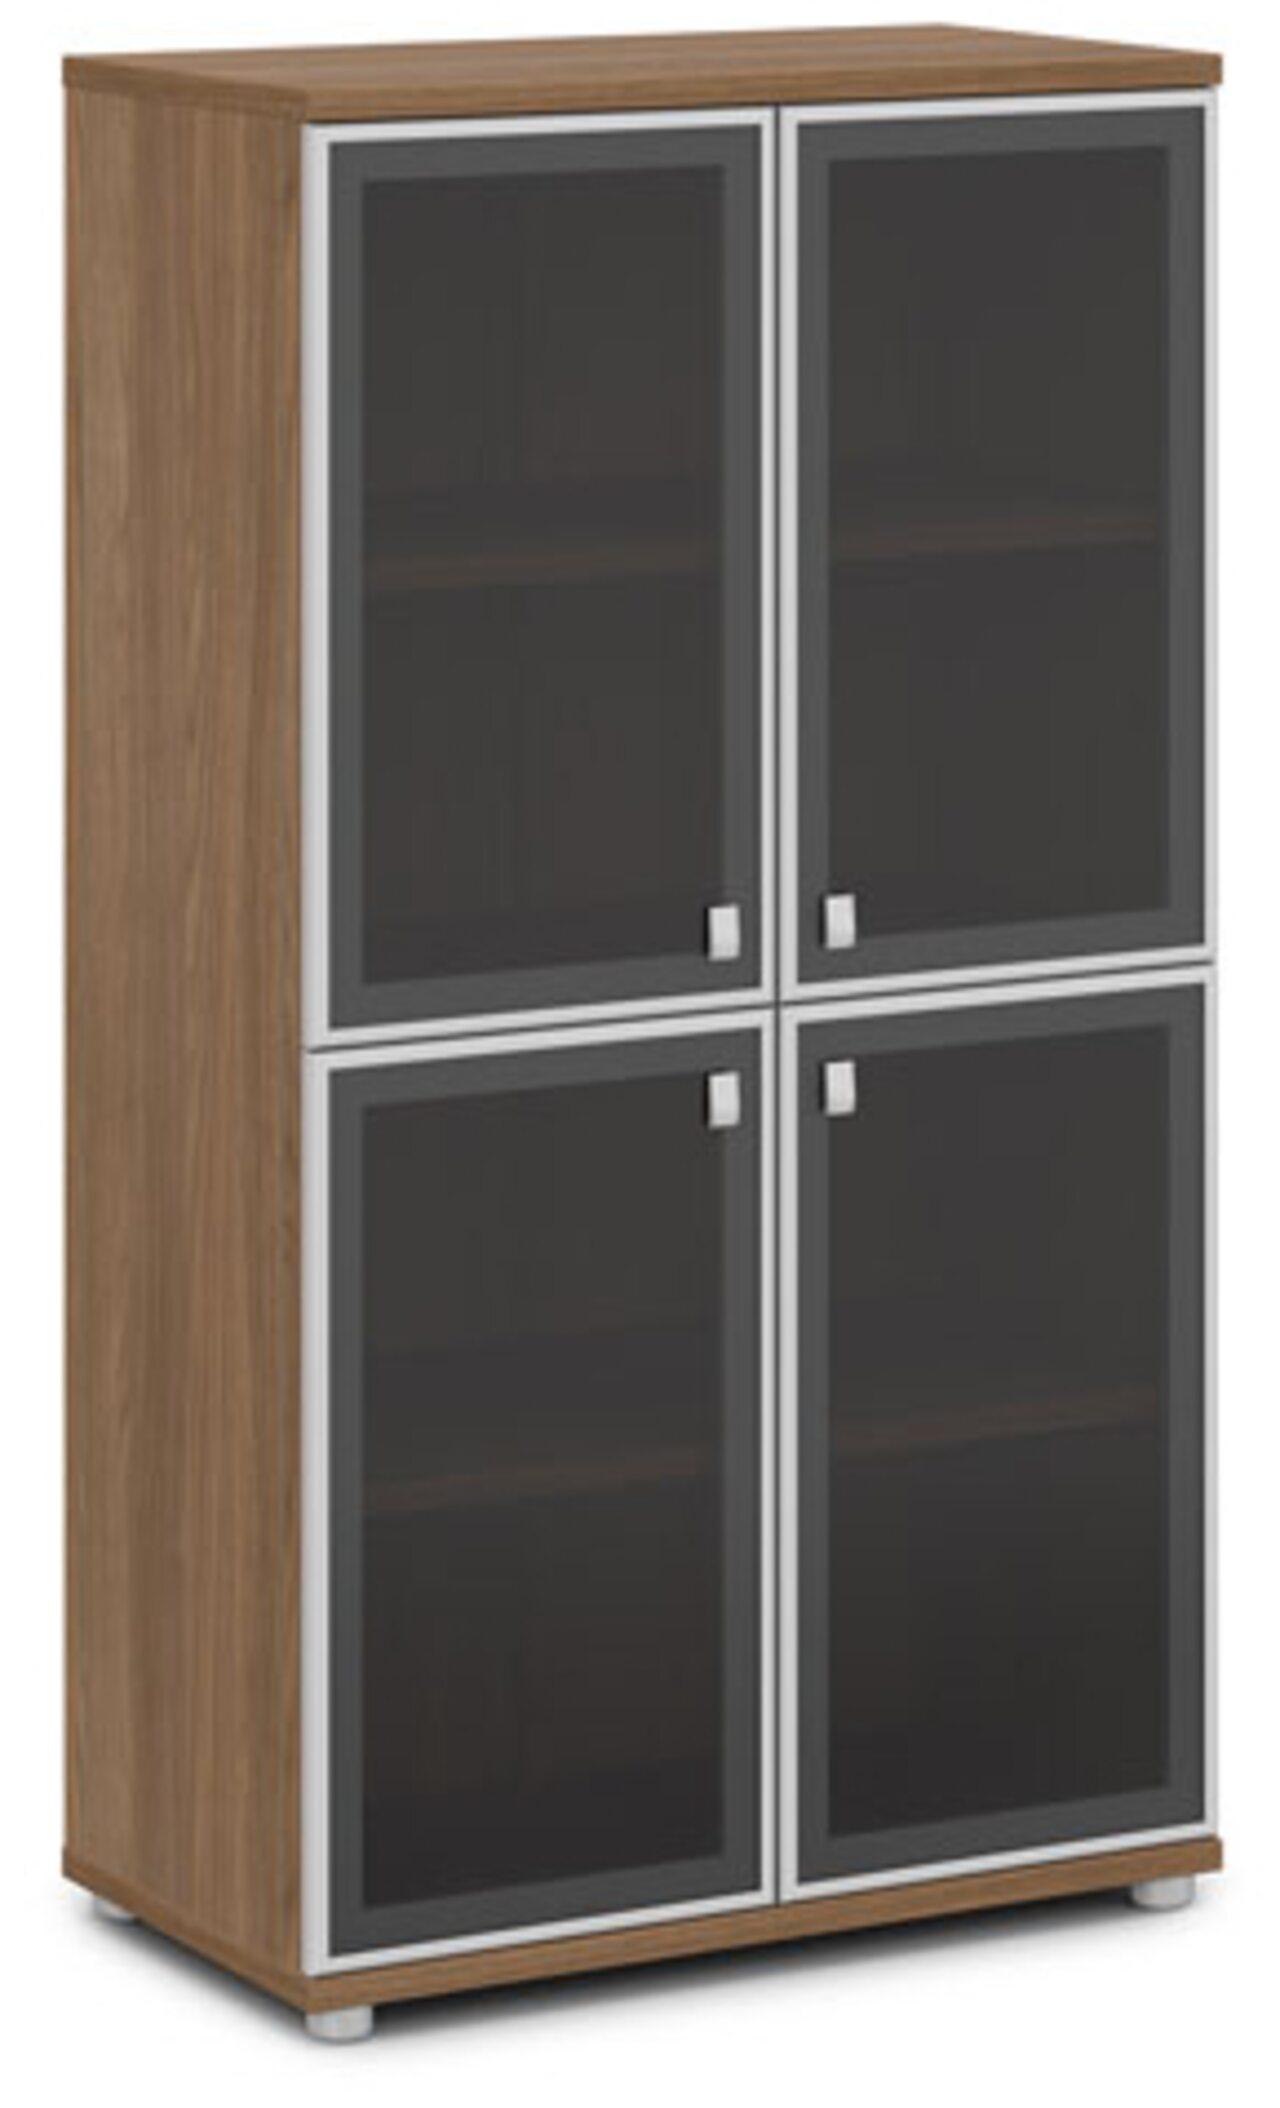 Шкаф со стеклом в алюминиевом профиле  Vasanta 82x44x149 - фото 5